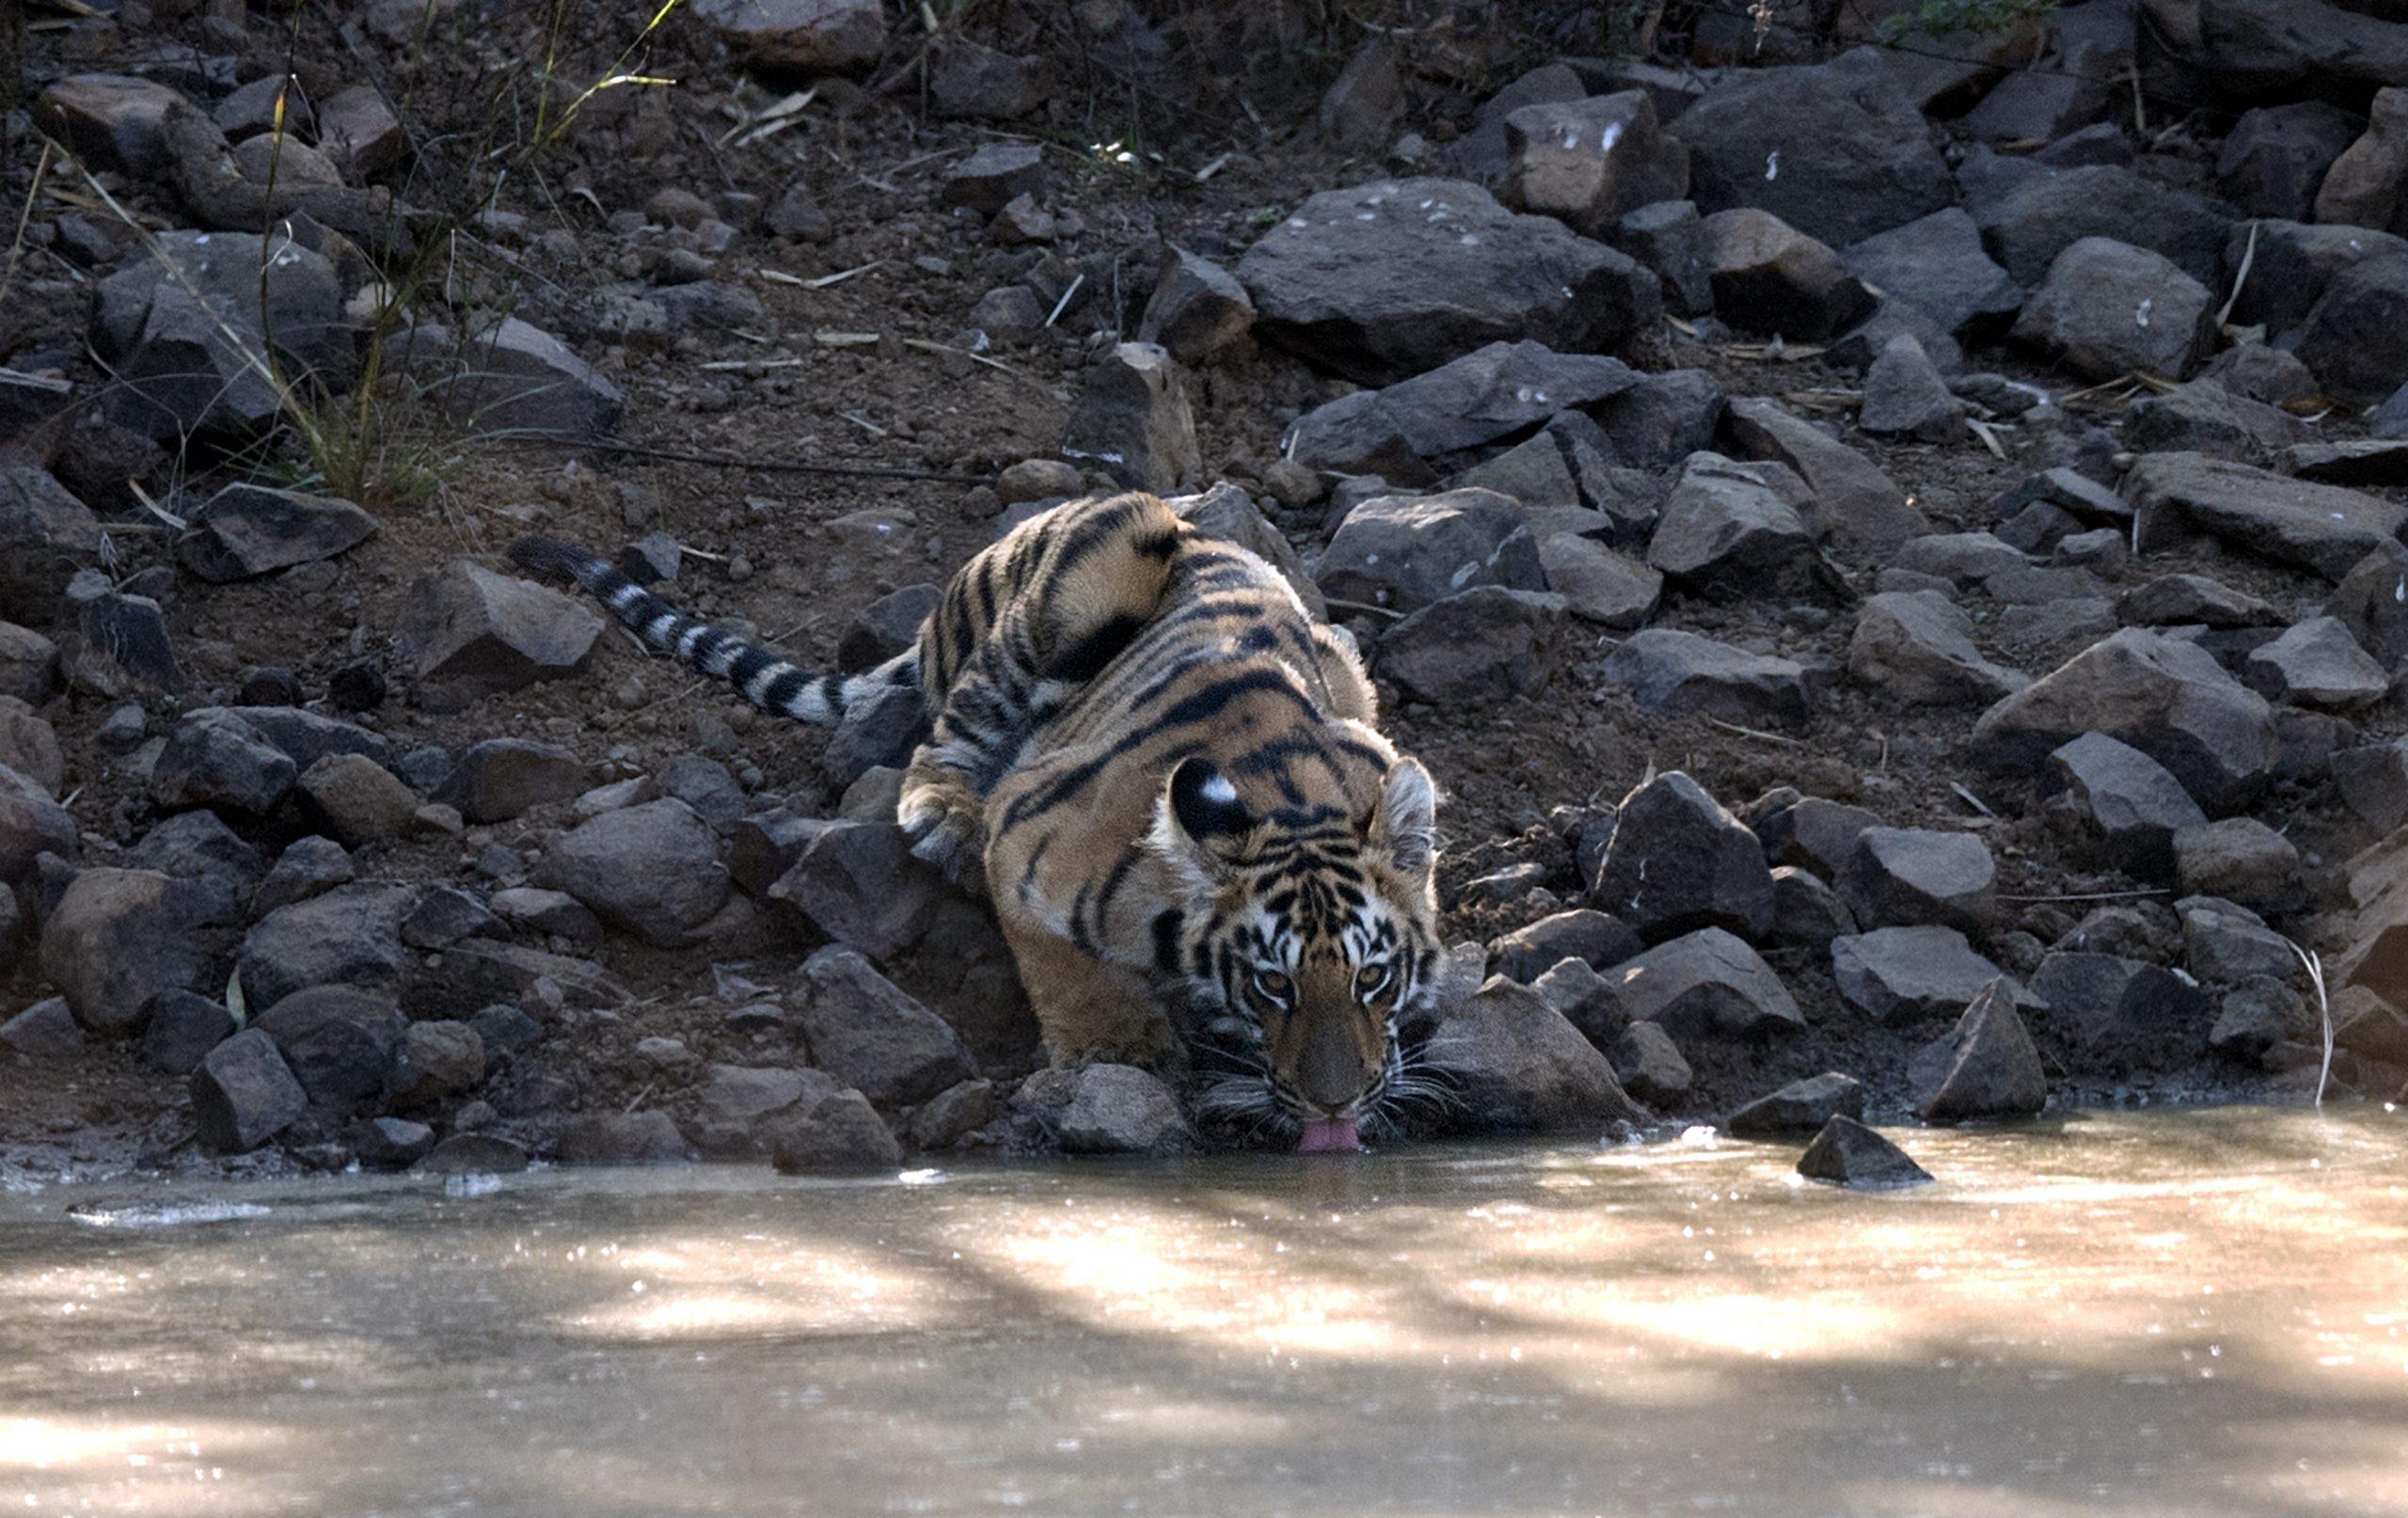 Tiger Cub Drinking Water